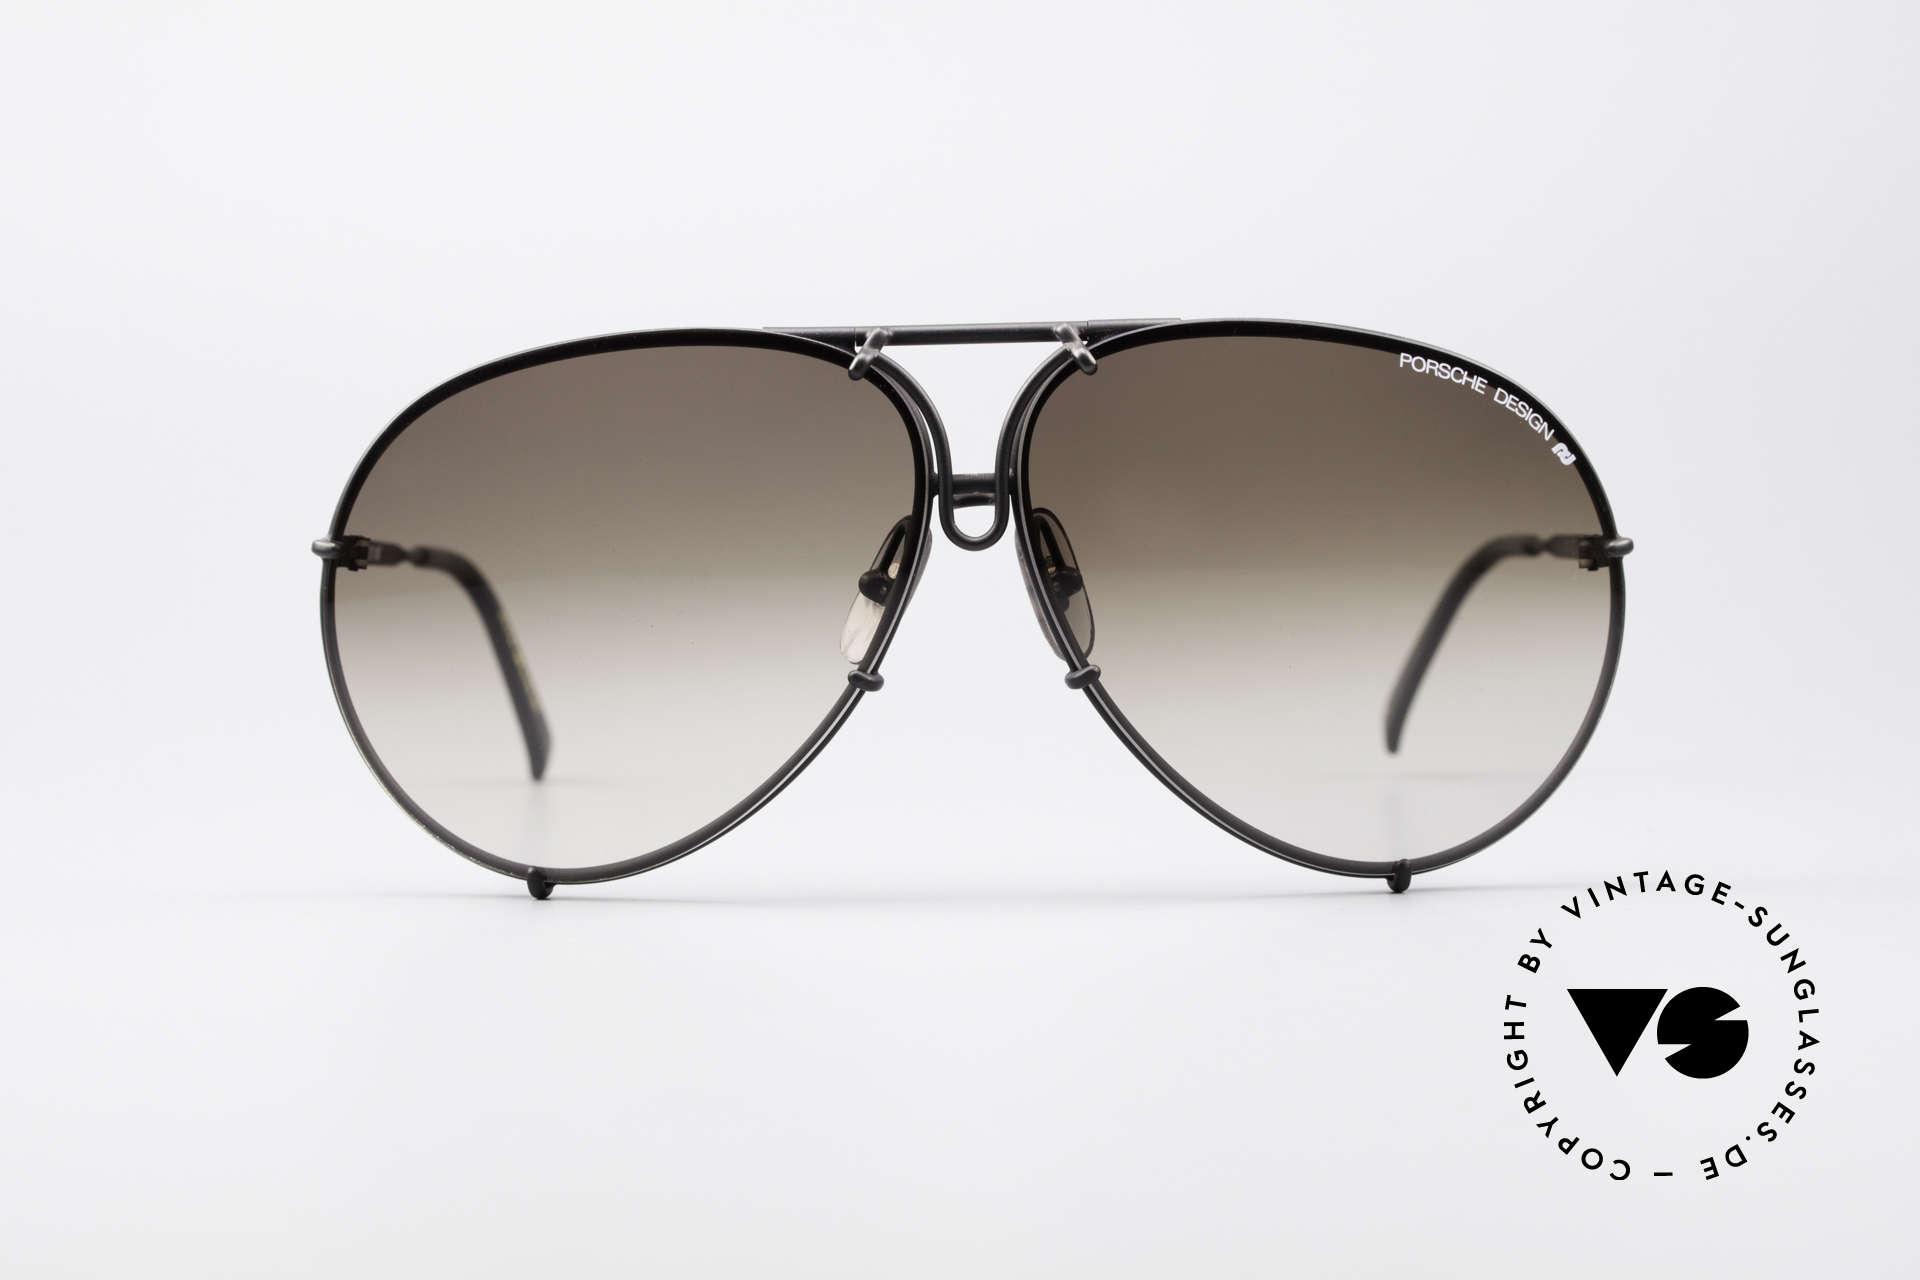 dcf8a1a0180 Sunglasses Porsche 5621 Large 80 s Aviator Shades